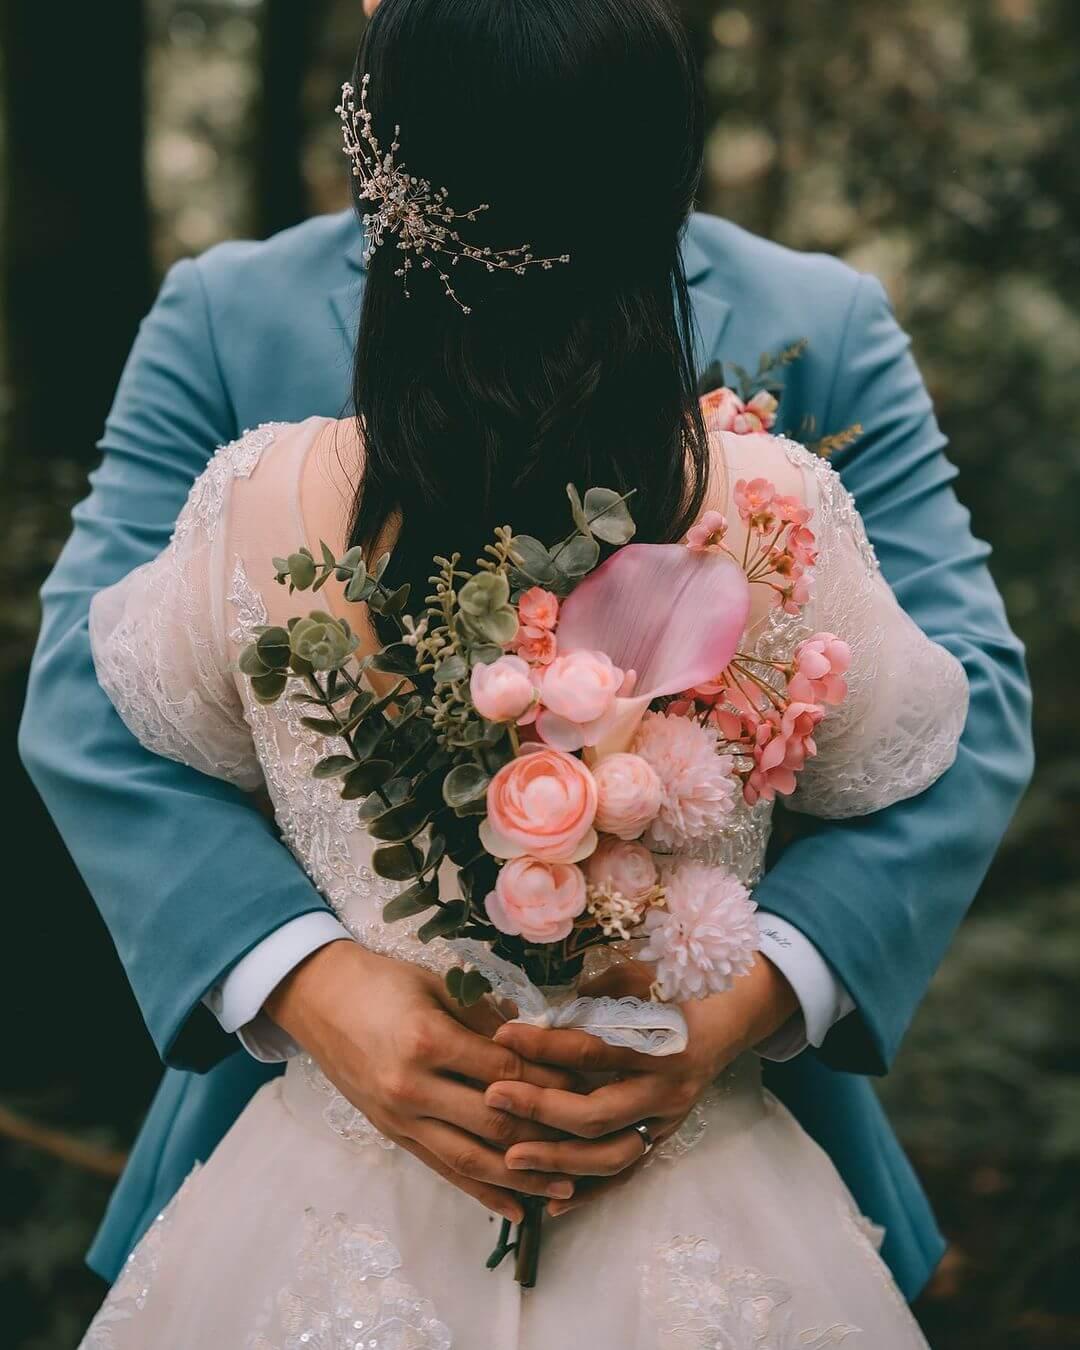 THE FAIRY TALE PROPOSAL pre-wedding Photoshoot Ideas